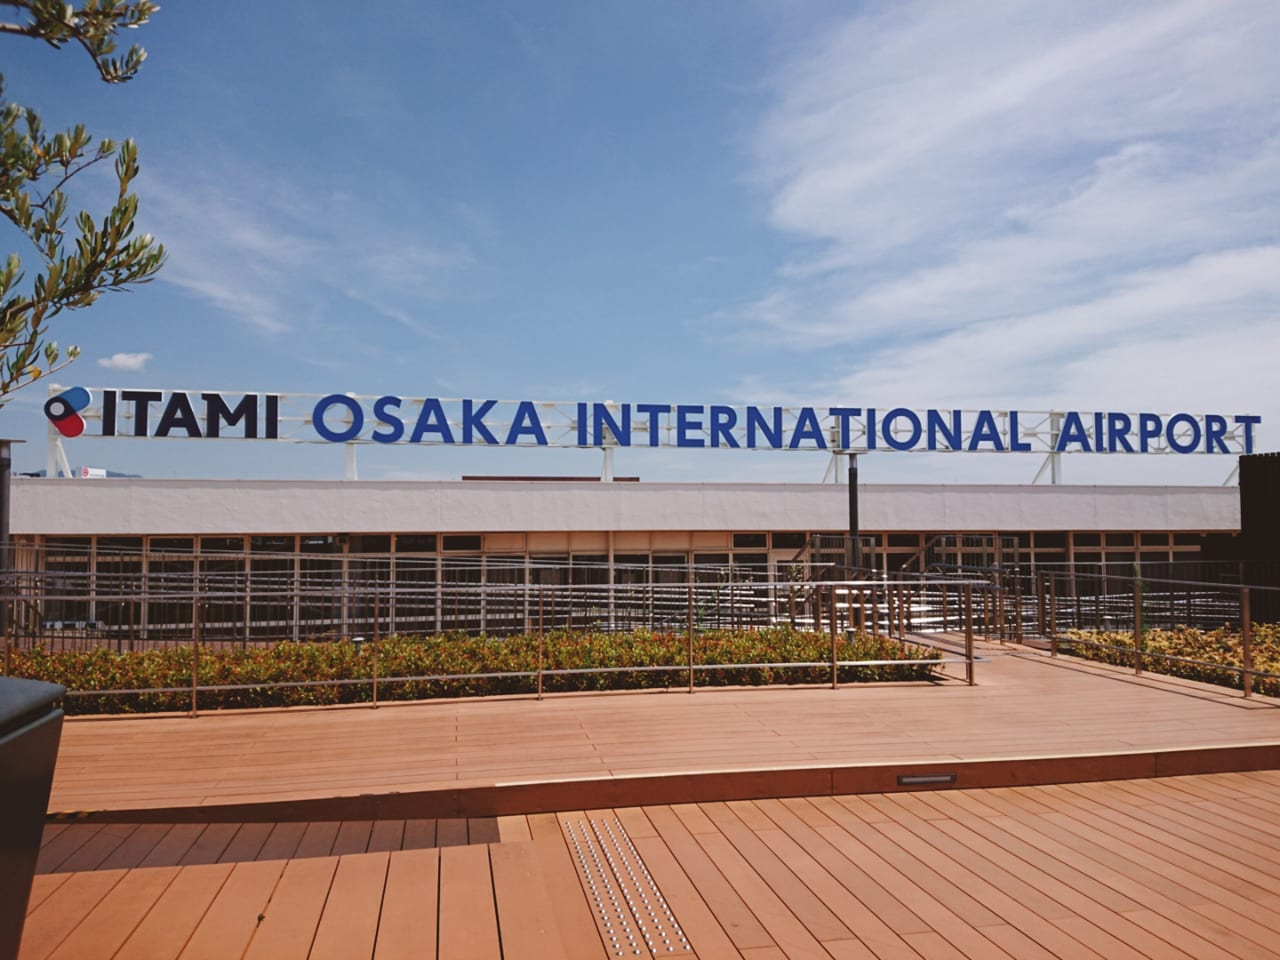 大阪国際空港の看板